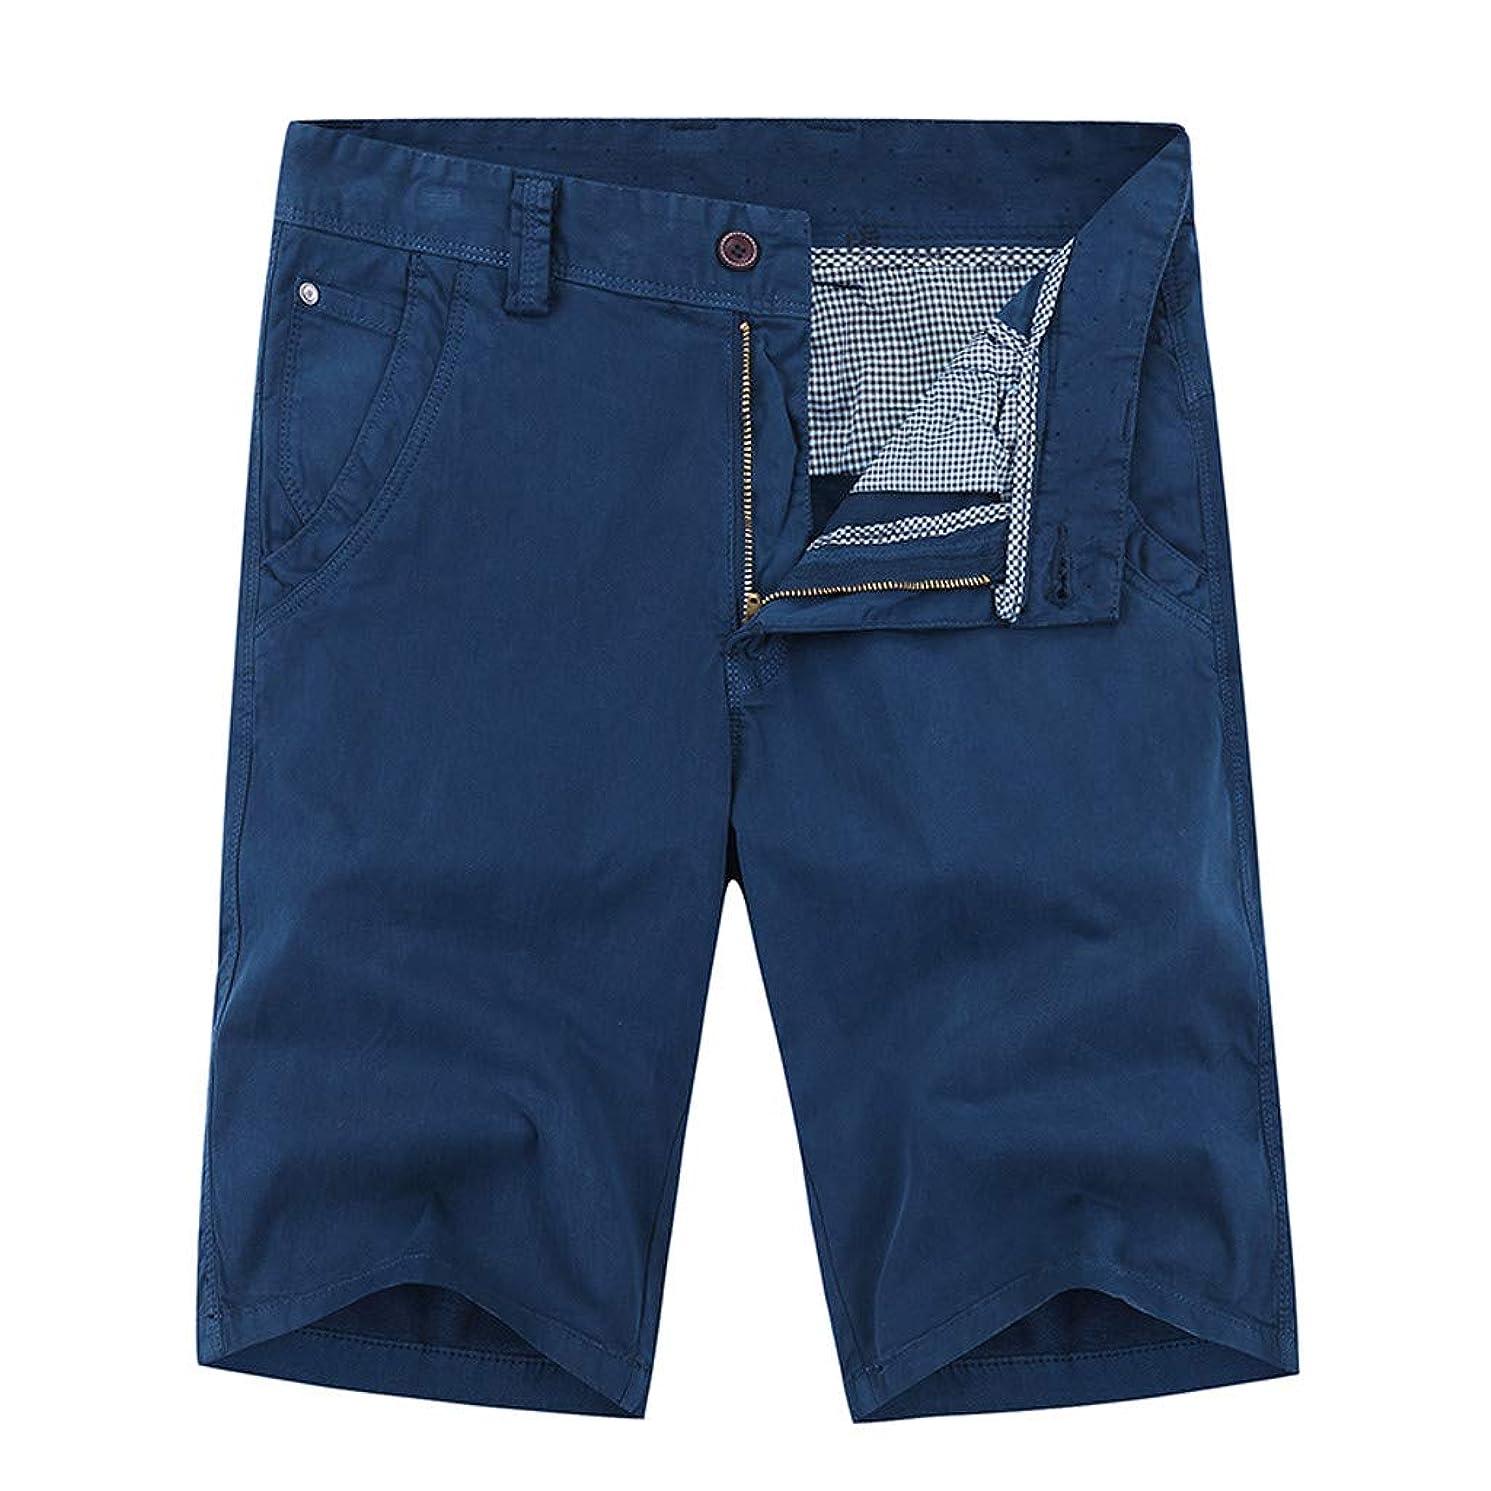 Mens Shorts Casual Men Shorts Cargo 5 Inch Mens Shorts with Zipper Pockets Pants